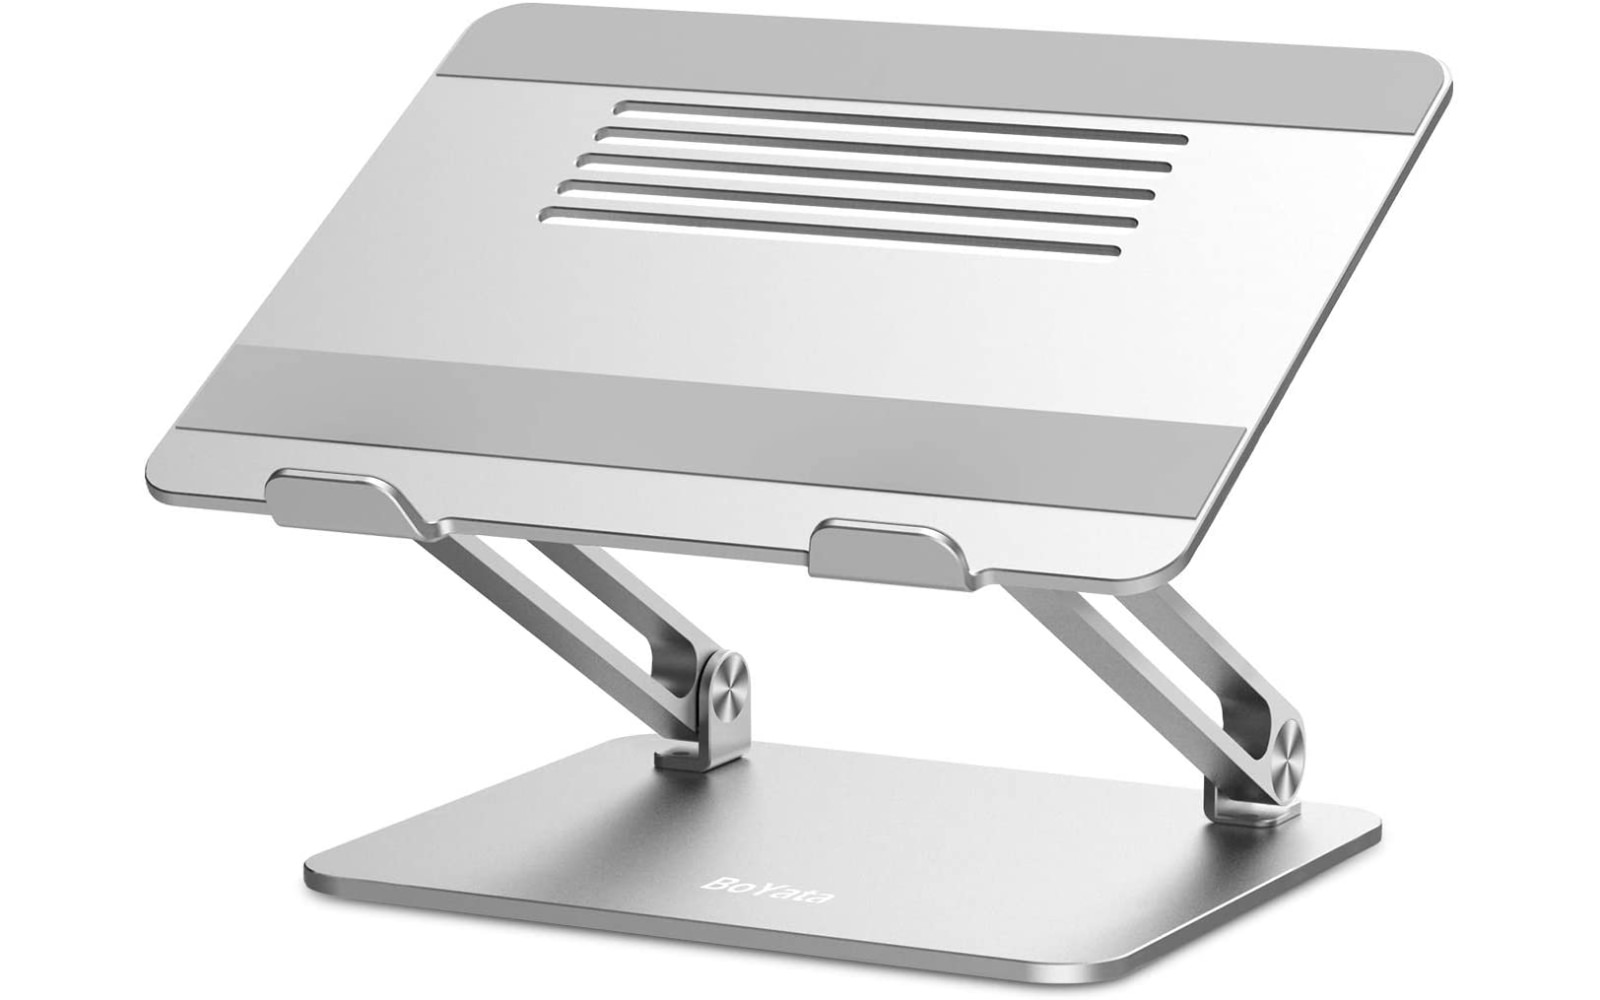 BoYoTa laptop stand